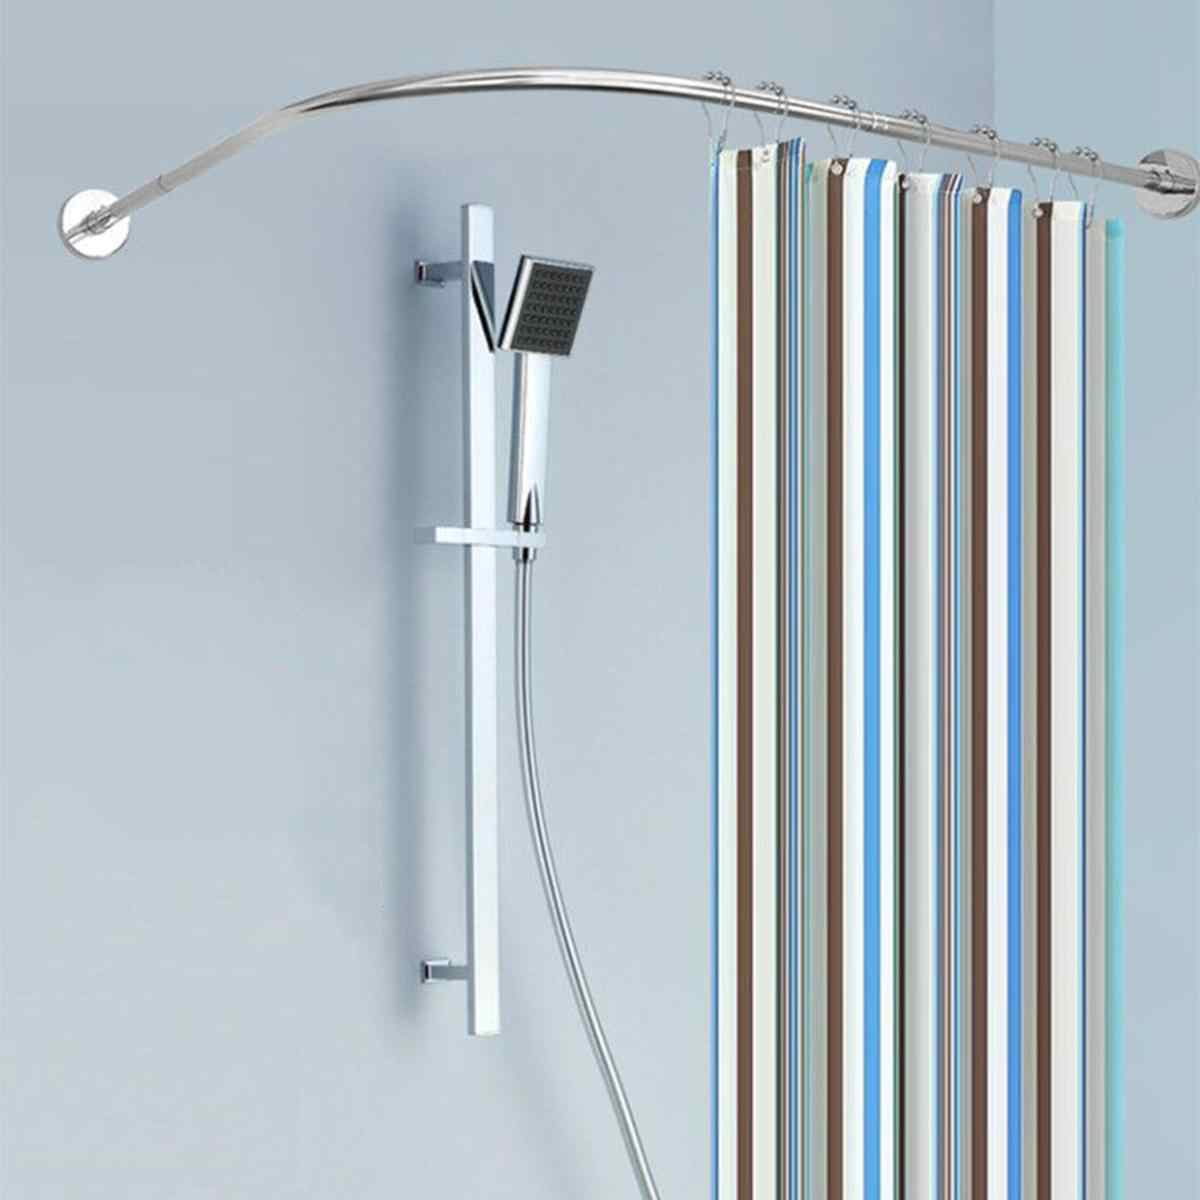 Expandable Curved Shower Curtain Rod 31 47inch Bath Tub